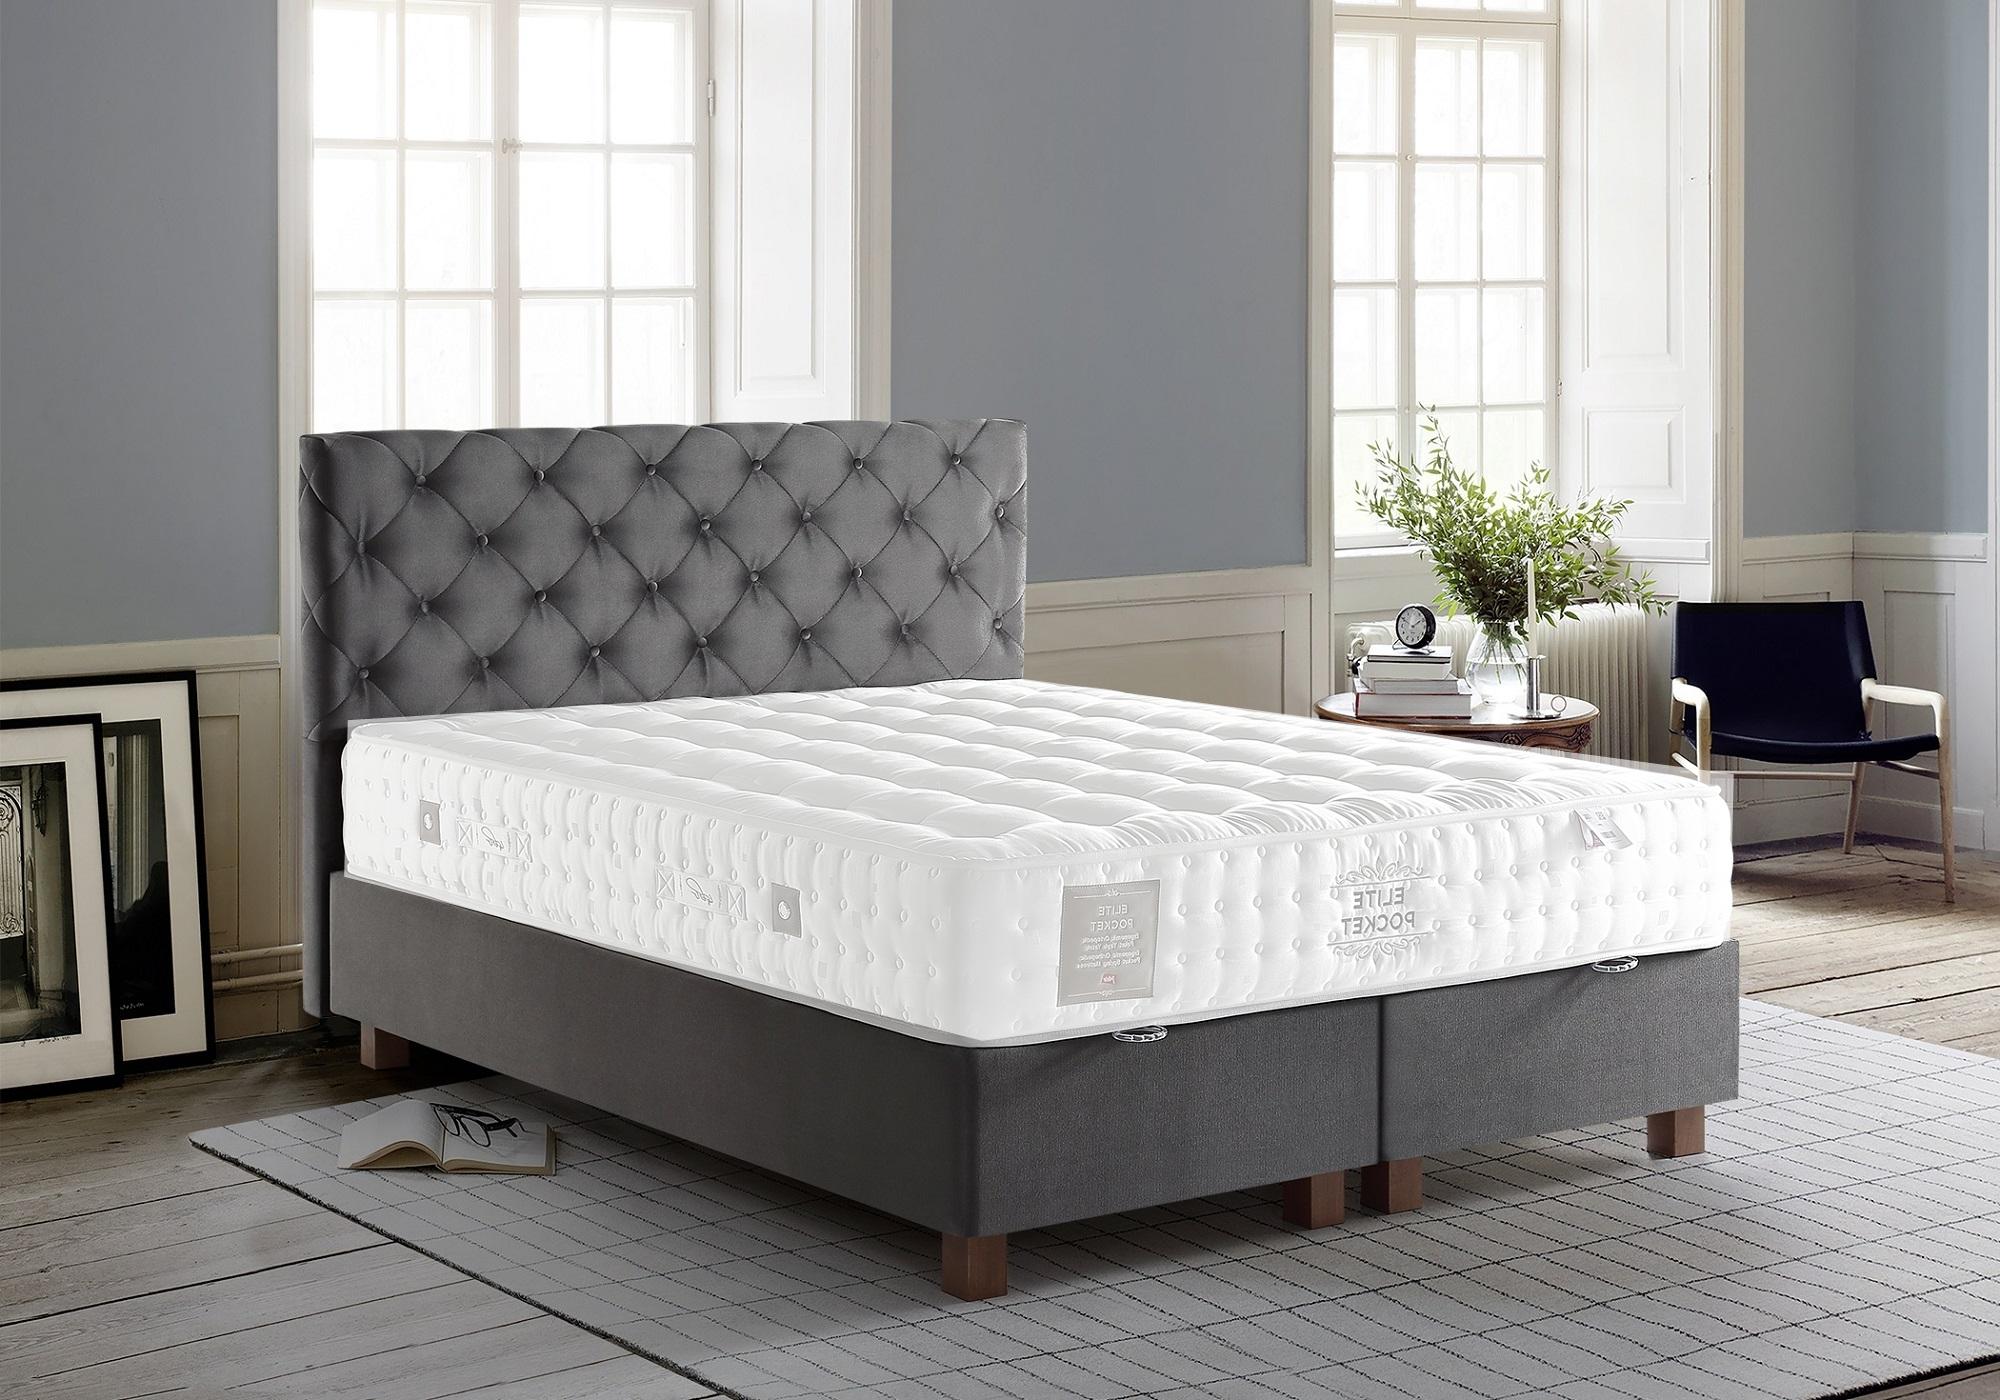 Lit coffre + tête de lit capitonnée gris 140x190 KARYA